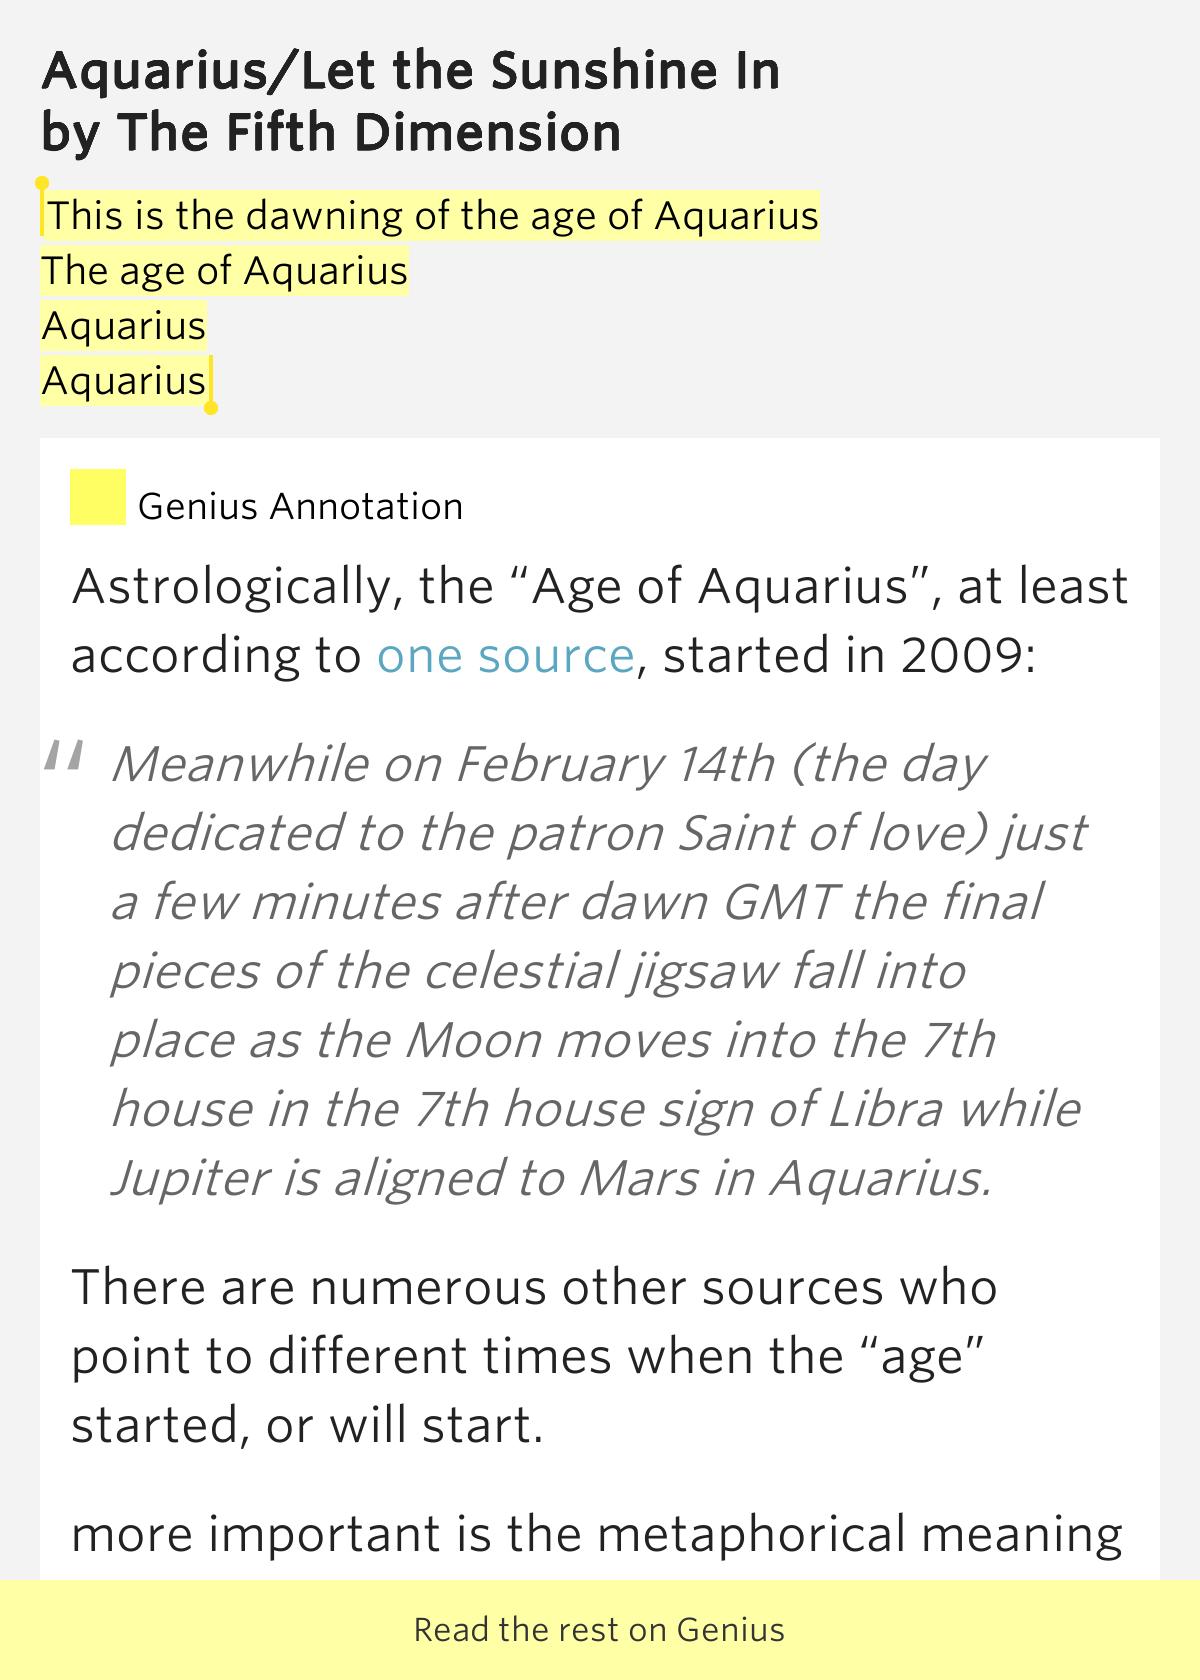 The 5th Dimension - Aquarius Lyrics | MetroLyrics